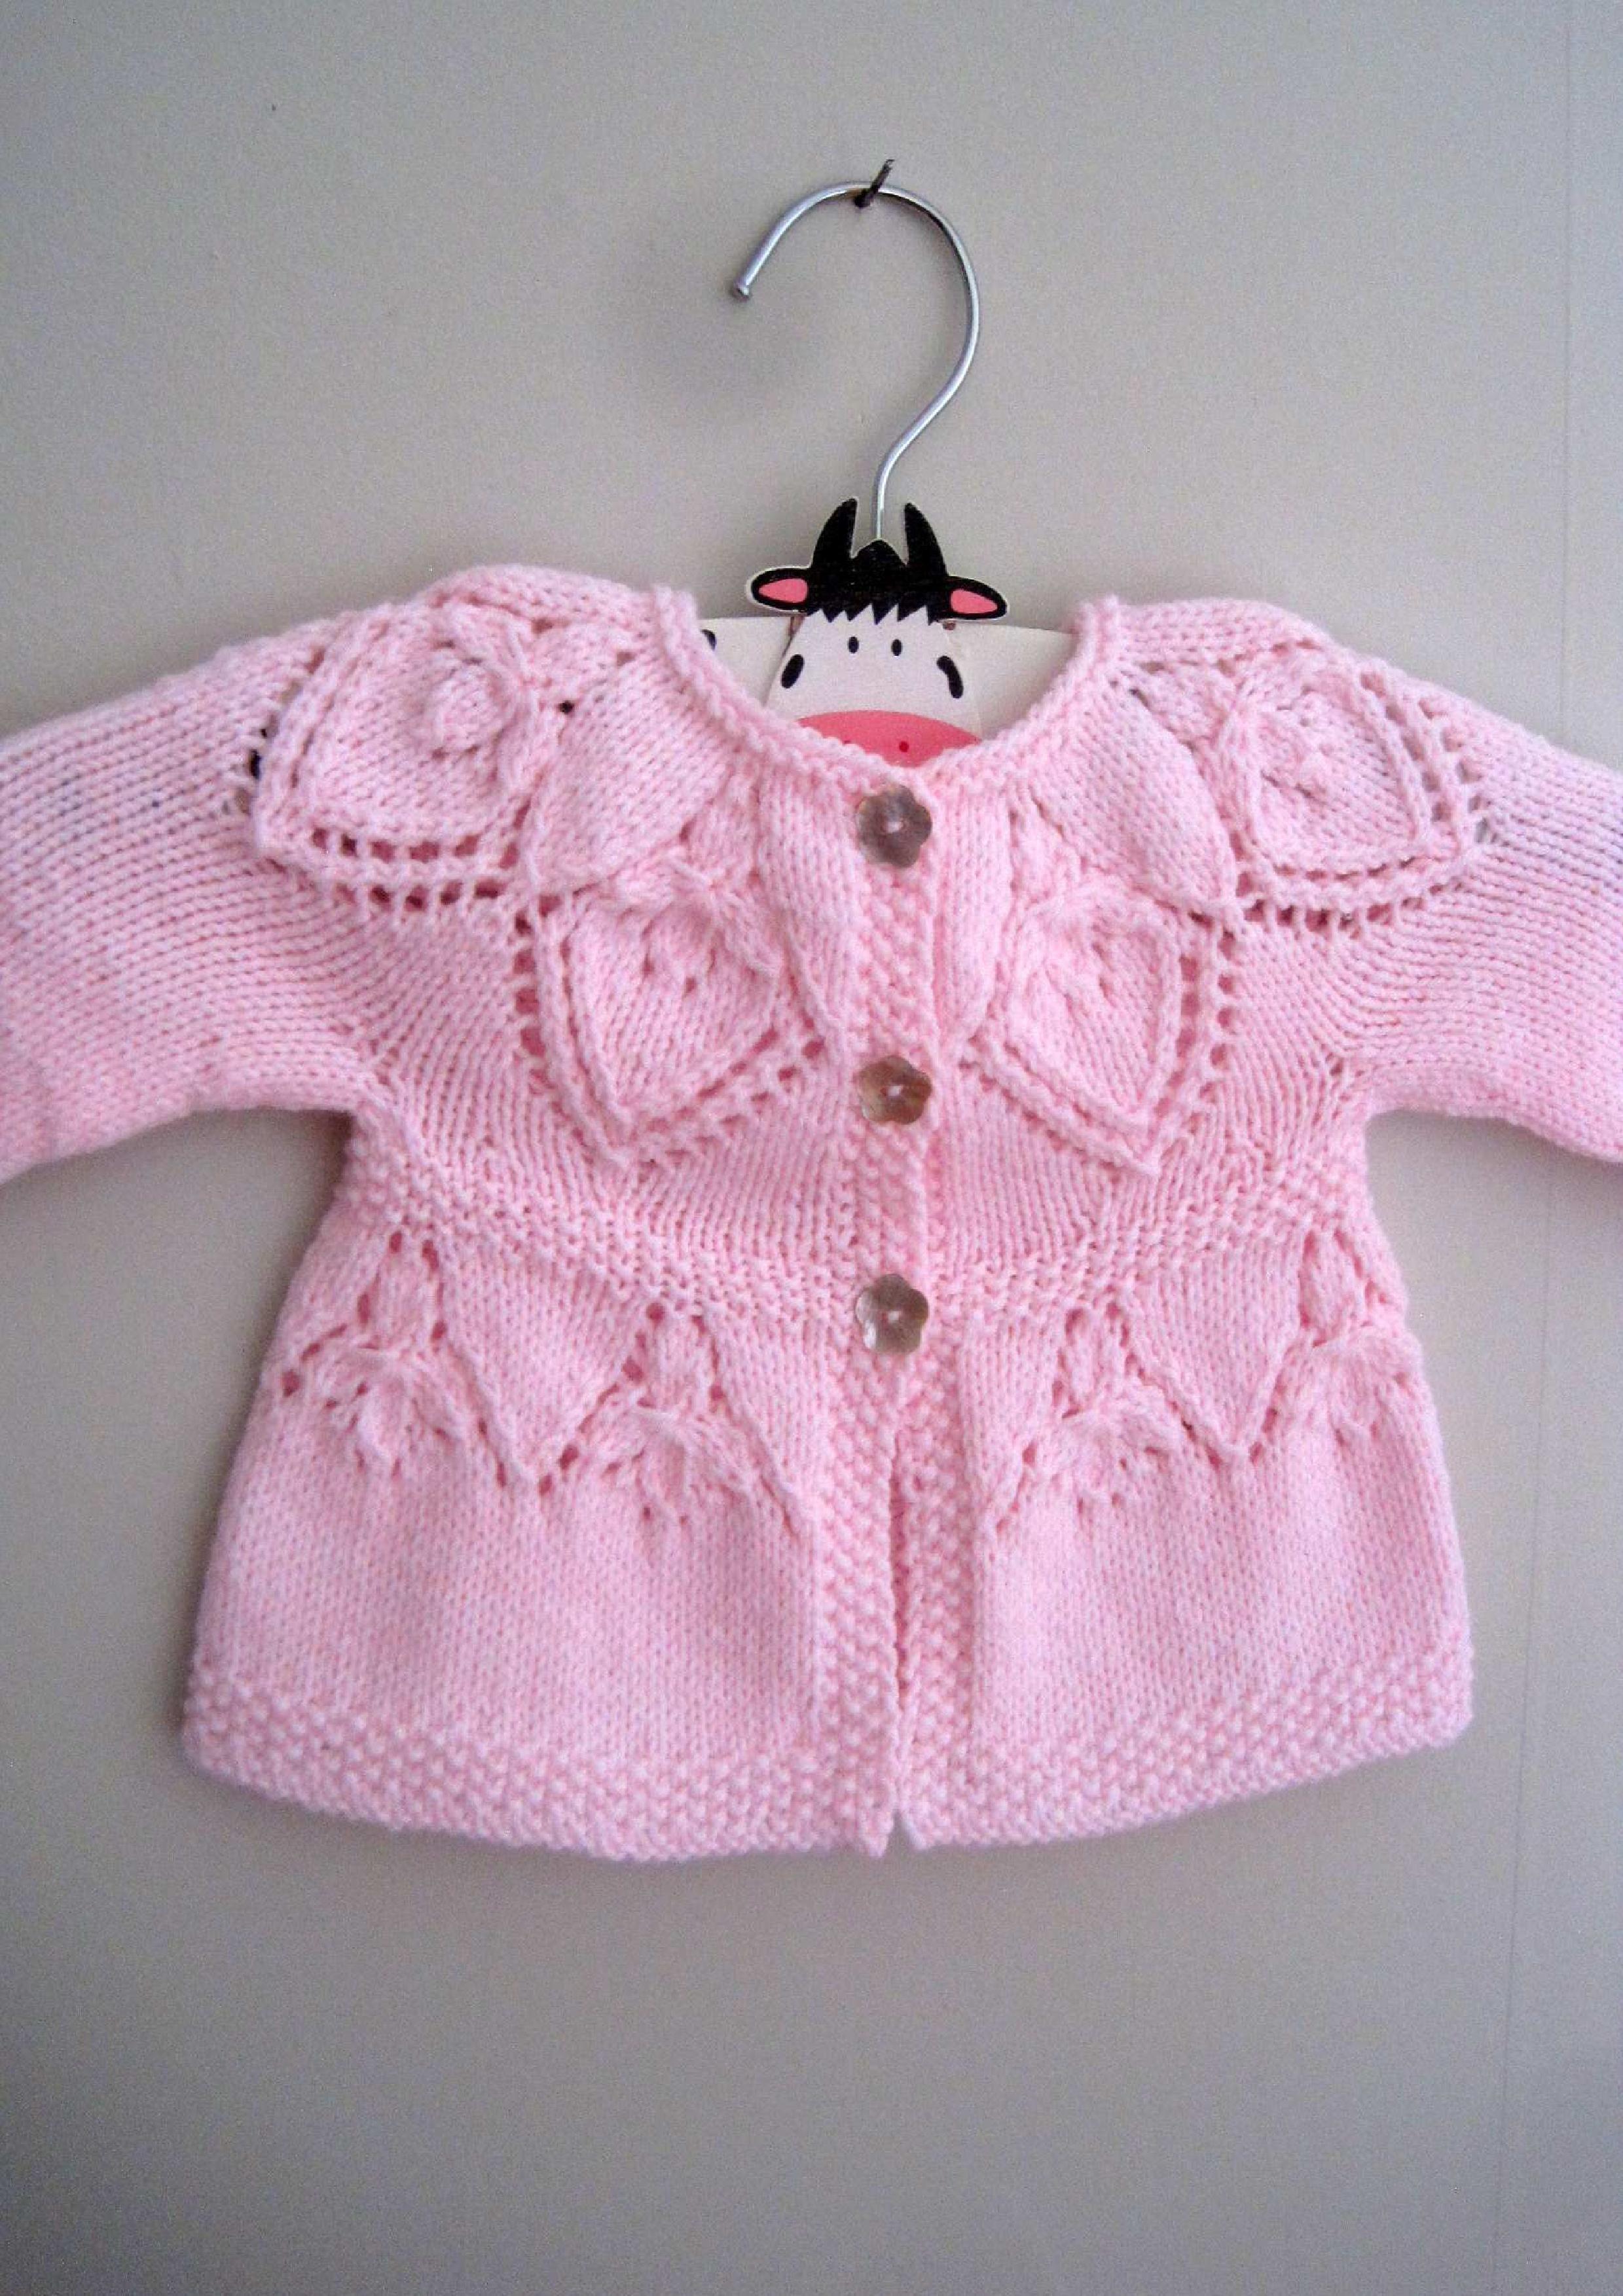 Sylvie Cardi Knitting Pattern. Baby sweater, cardigan knitting ...